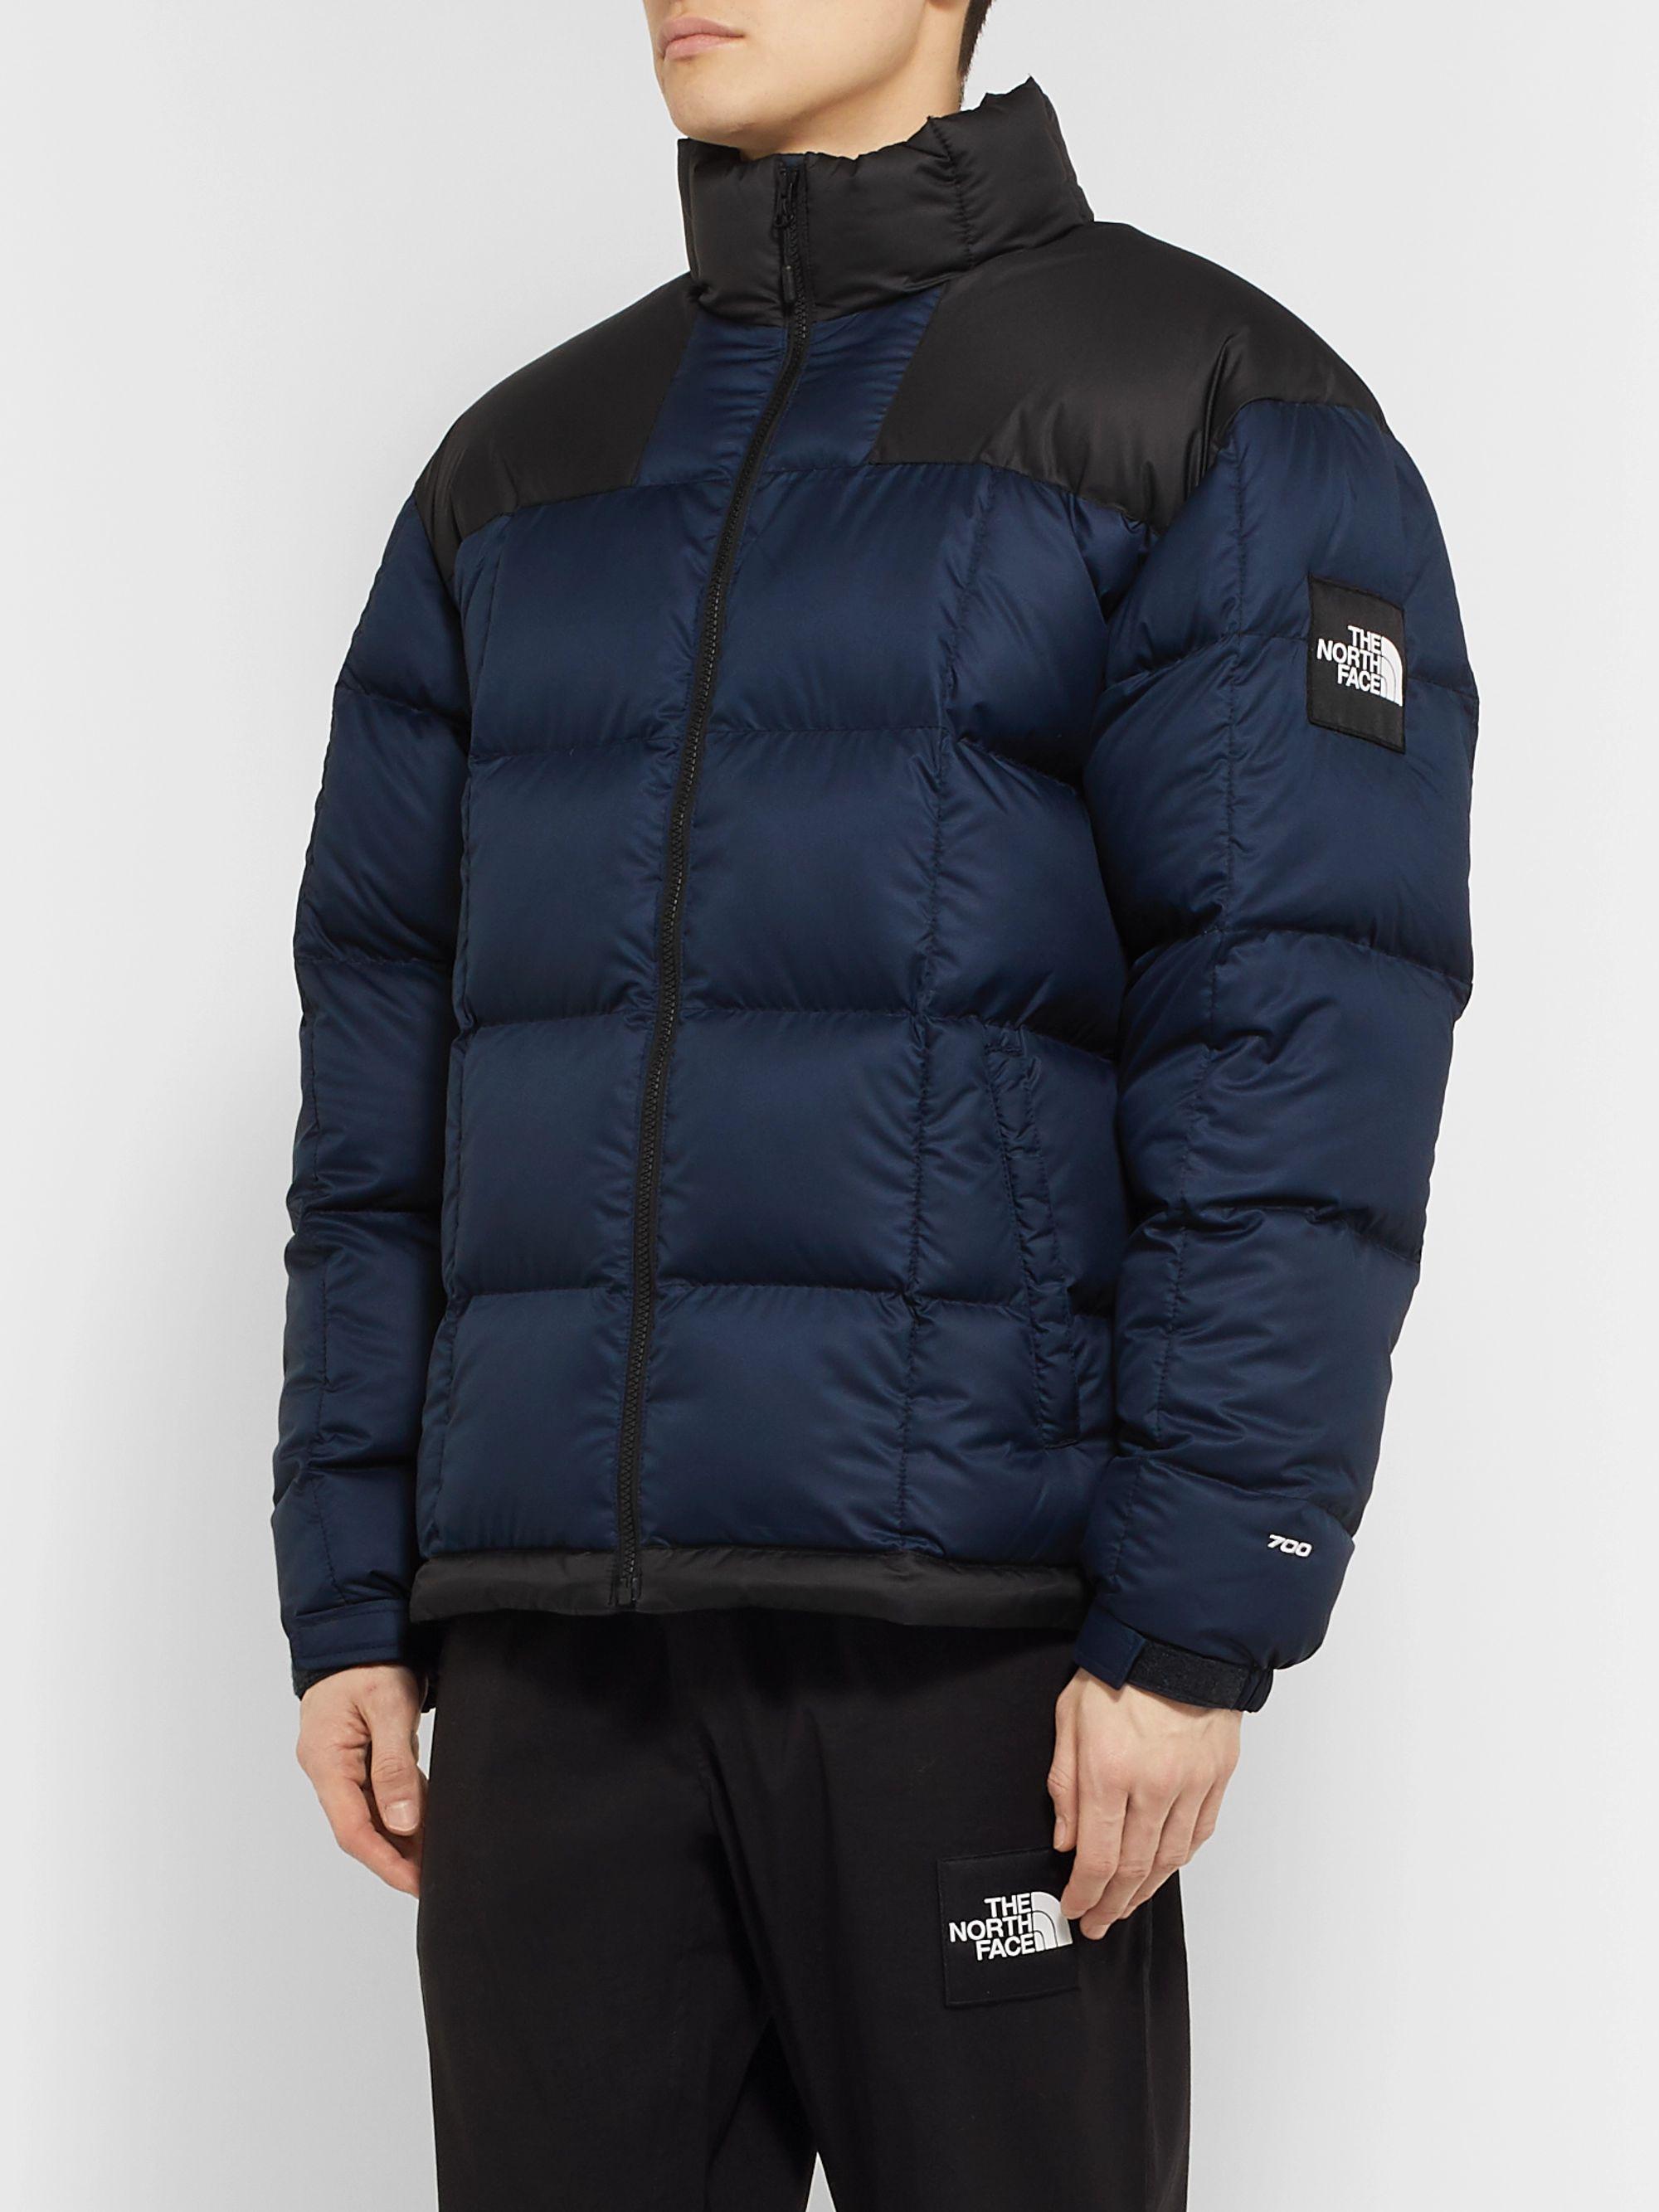 The North Face Lhotse Down Jacket Black